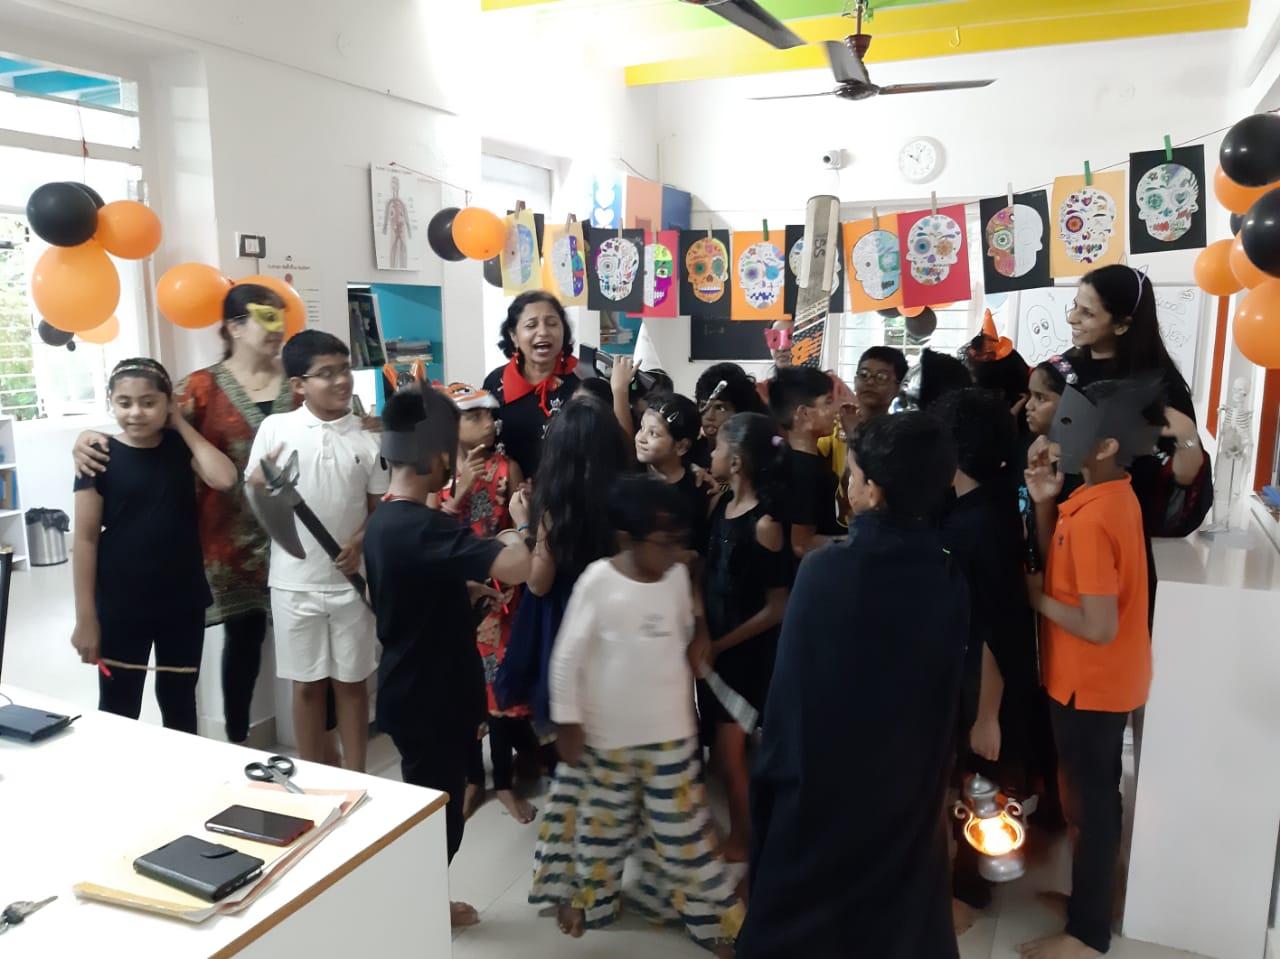 Surprise visit by Smita aunty!